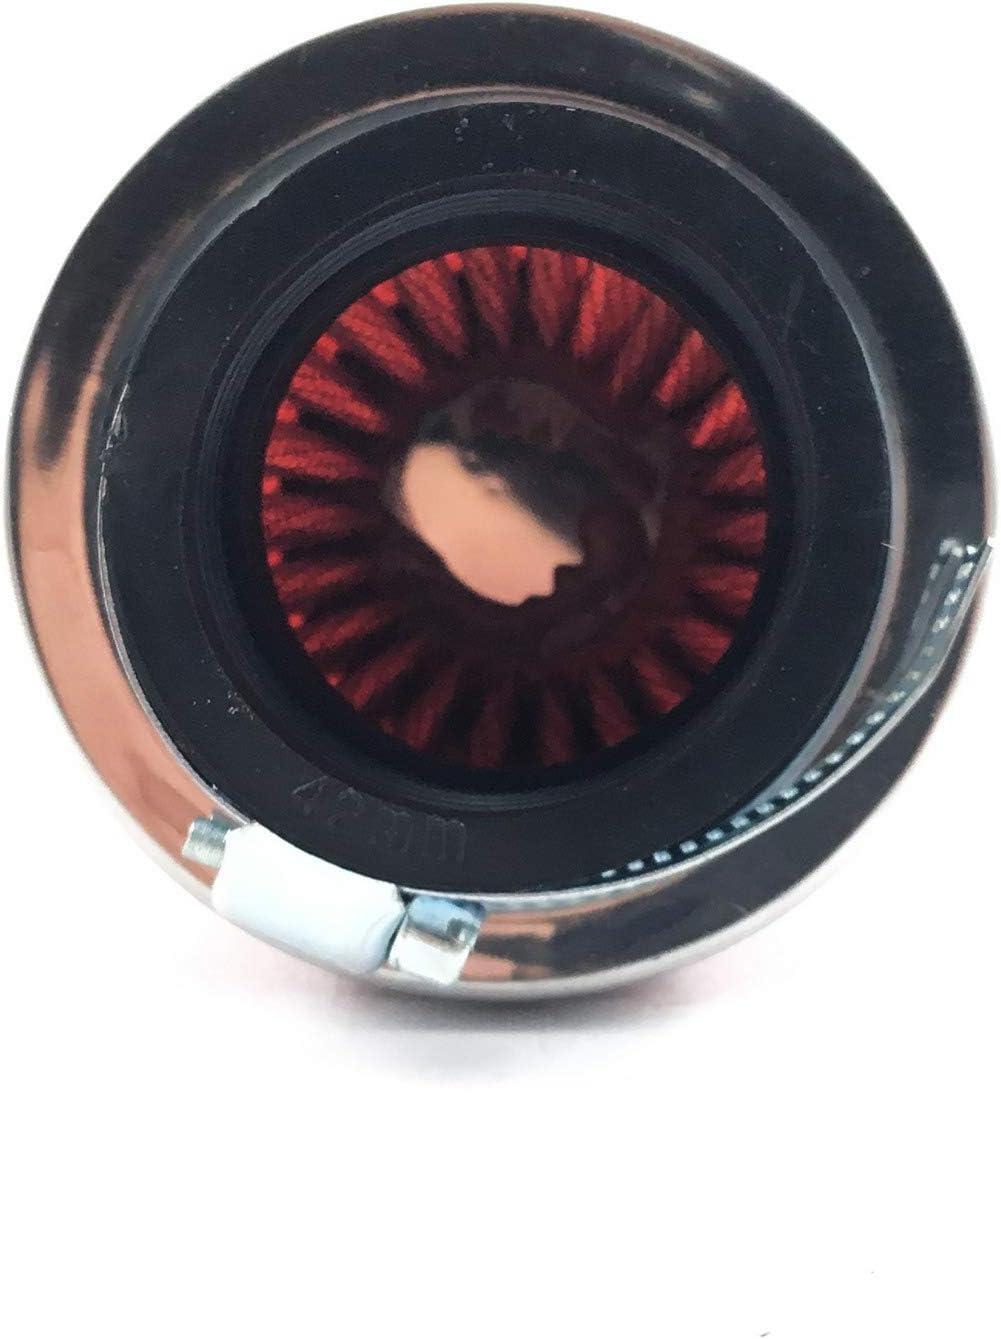 250 ccm ad esempio Baotian Rexoto Flex Tech JMSTAR BENZHOU YIYING REX BERO HYOSUNG PEGASUS 4 TAKT CHINA Roller RACING SPORT Filtro aria 42 mm in acciaio inox cromato look//filtro rosso//50